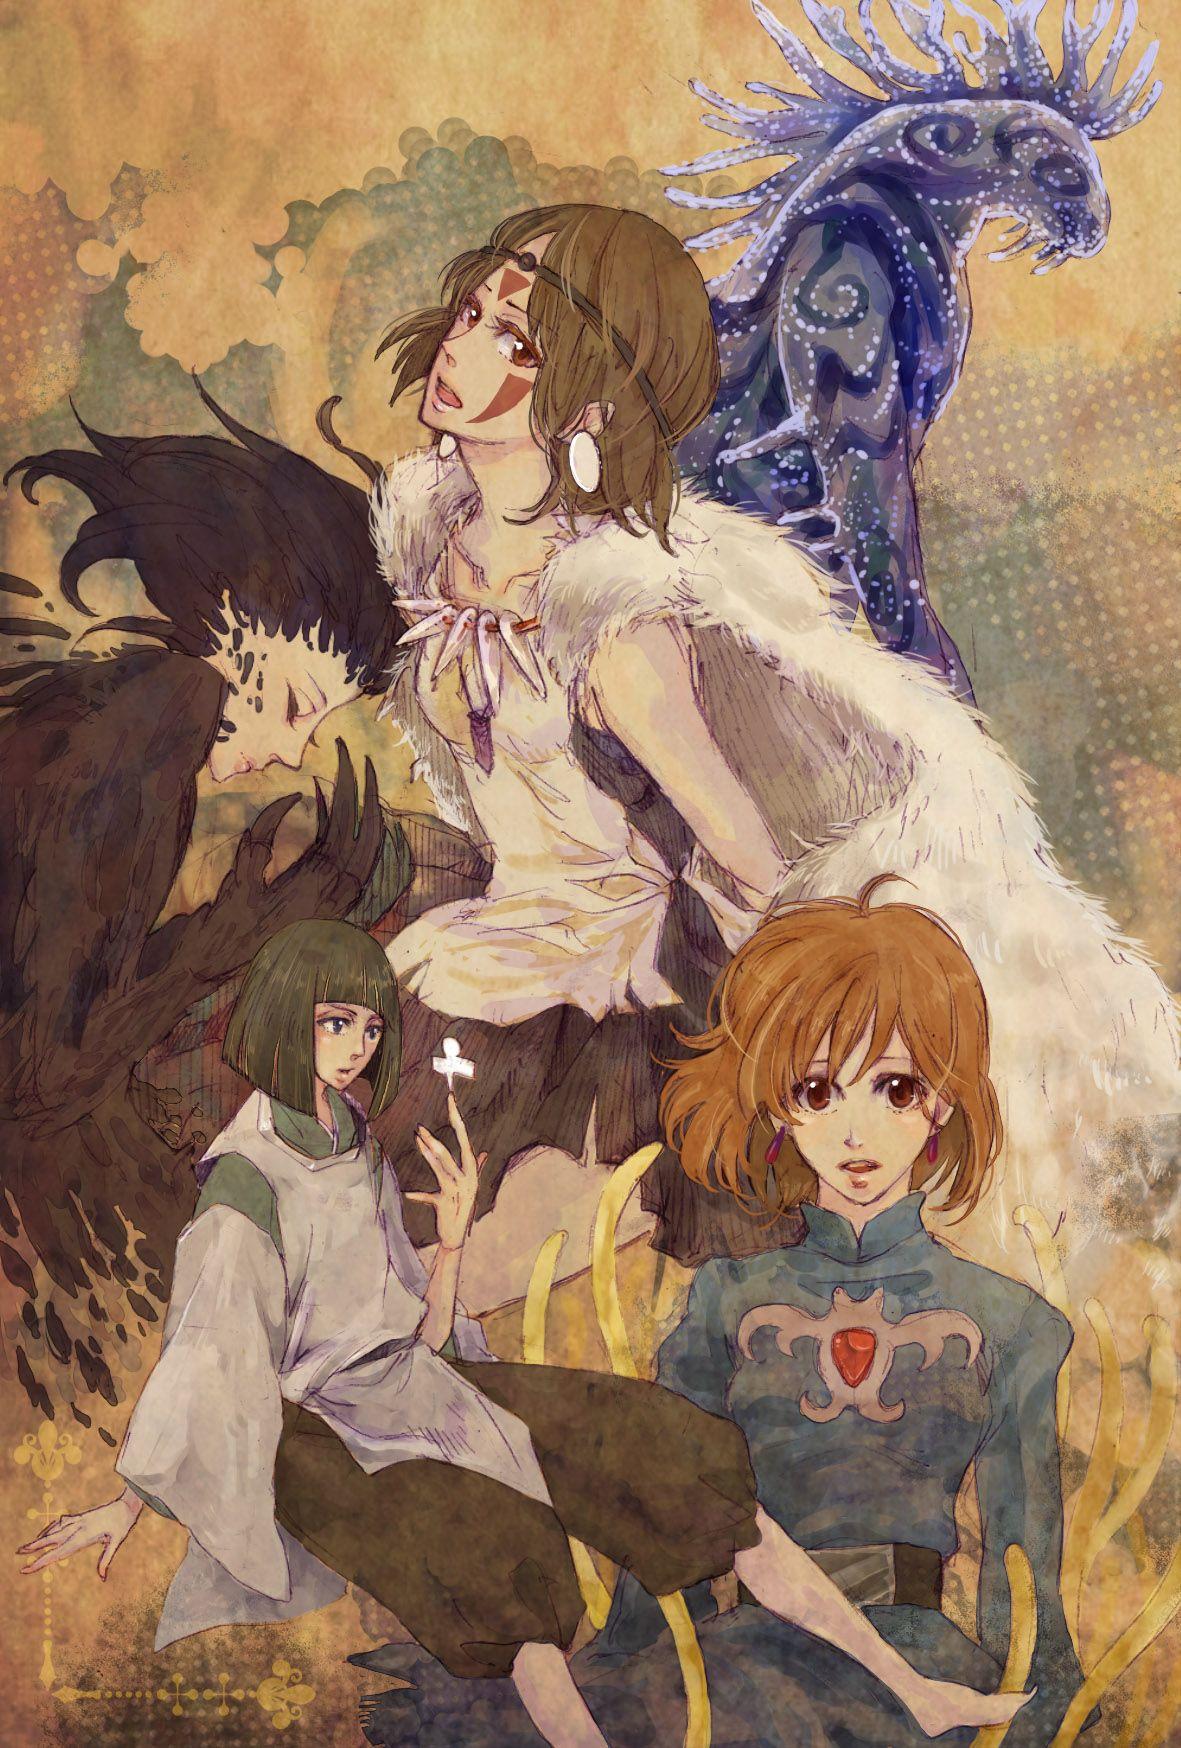 Fanart featuring characters from various Hayao Miyazaki